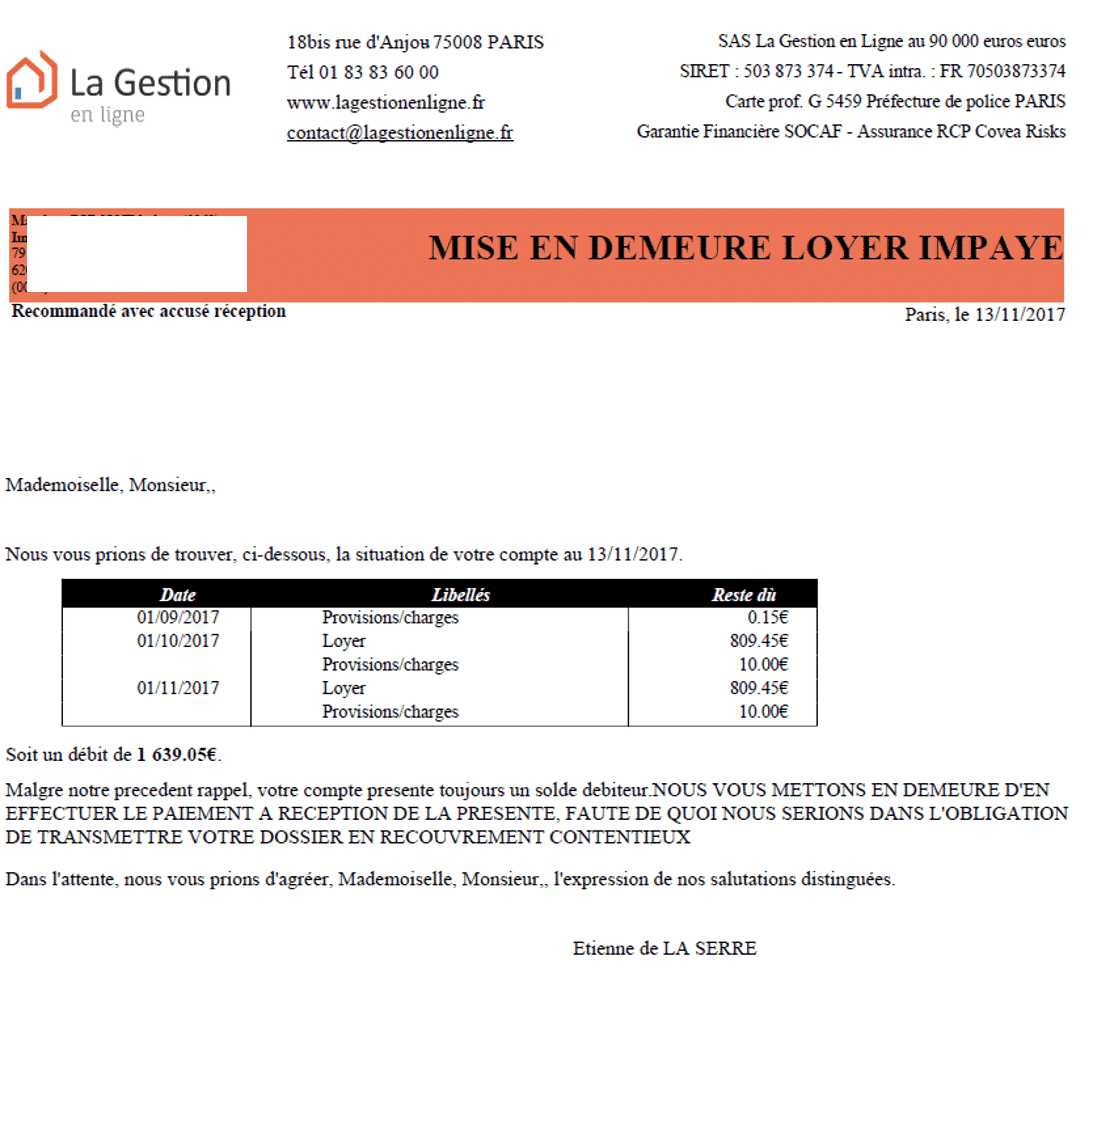 Assurance Loyer Impaye A 2 2 Avec La Gestion En Ligne